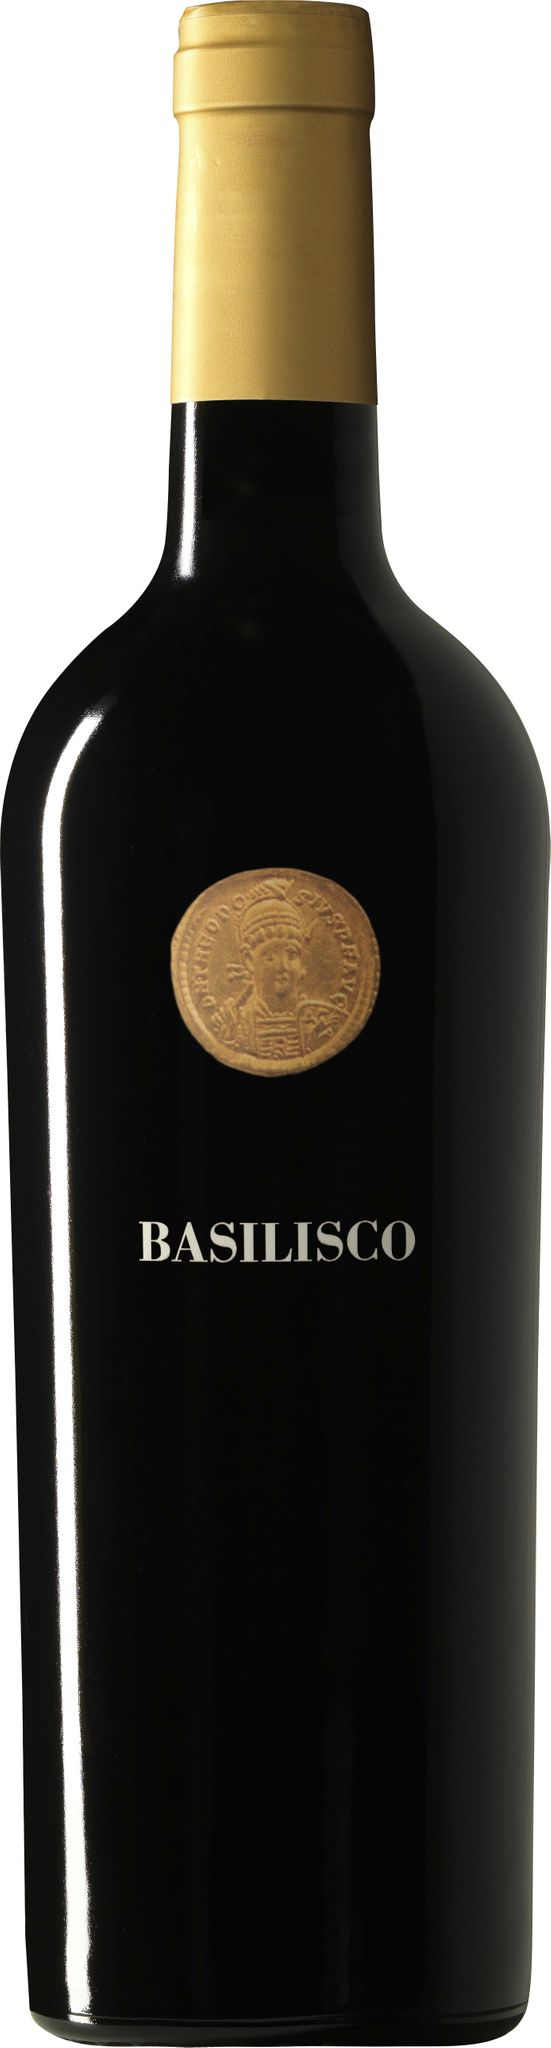 Produktbild på Basilisco